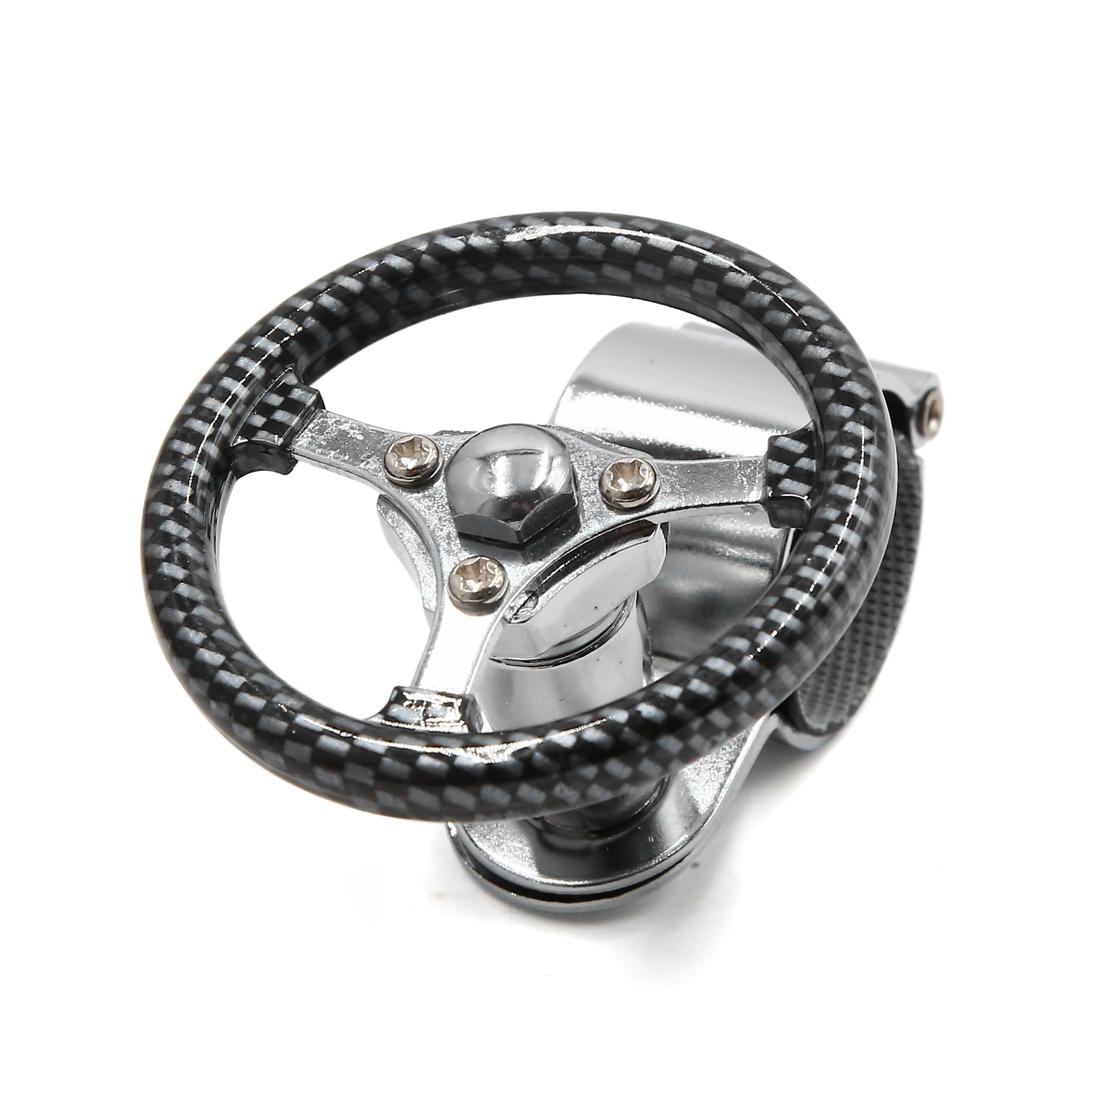 Car Steering Wheel Knob  Handle Power Turning Ball Carbon Fiber Pattern